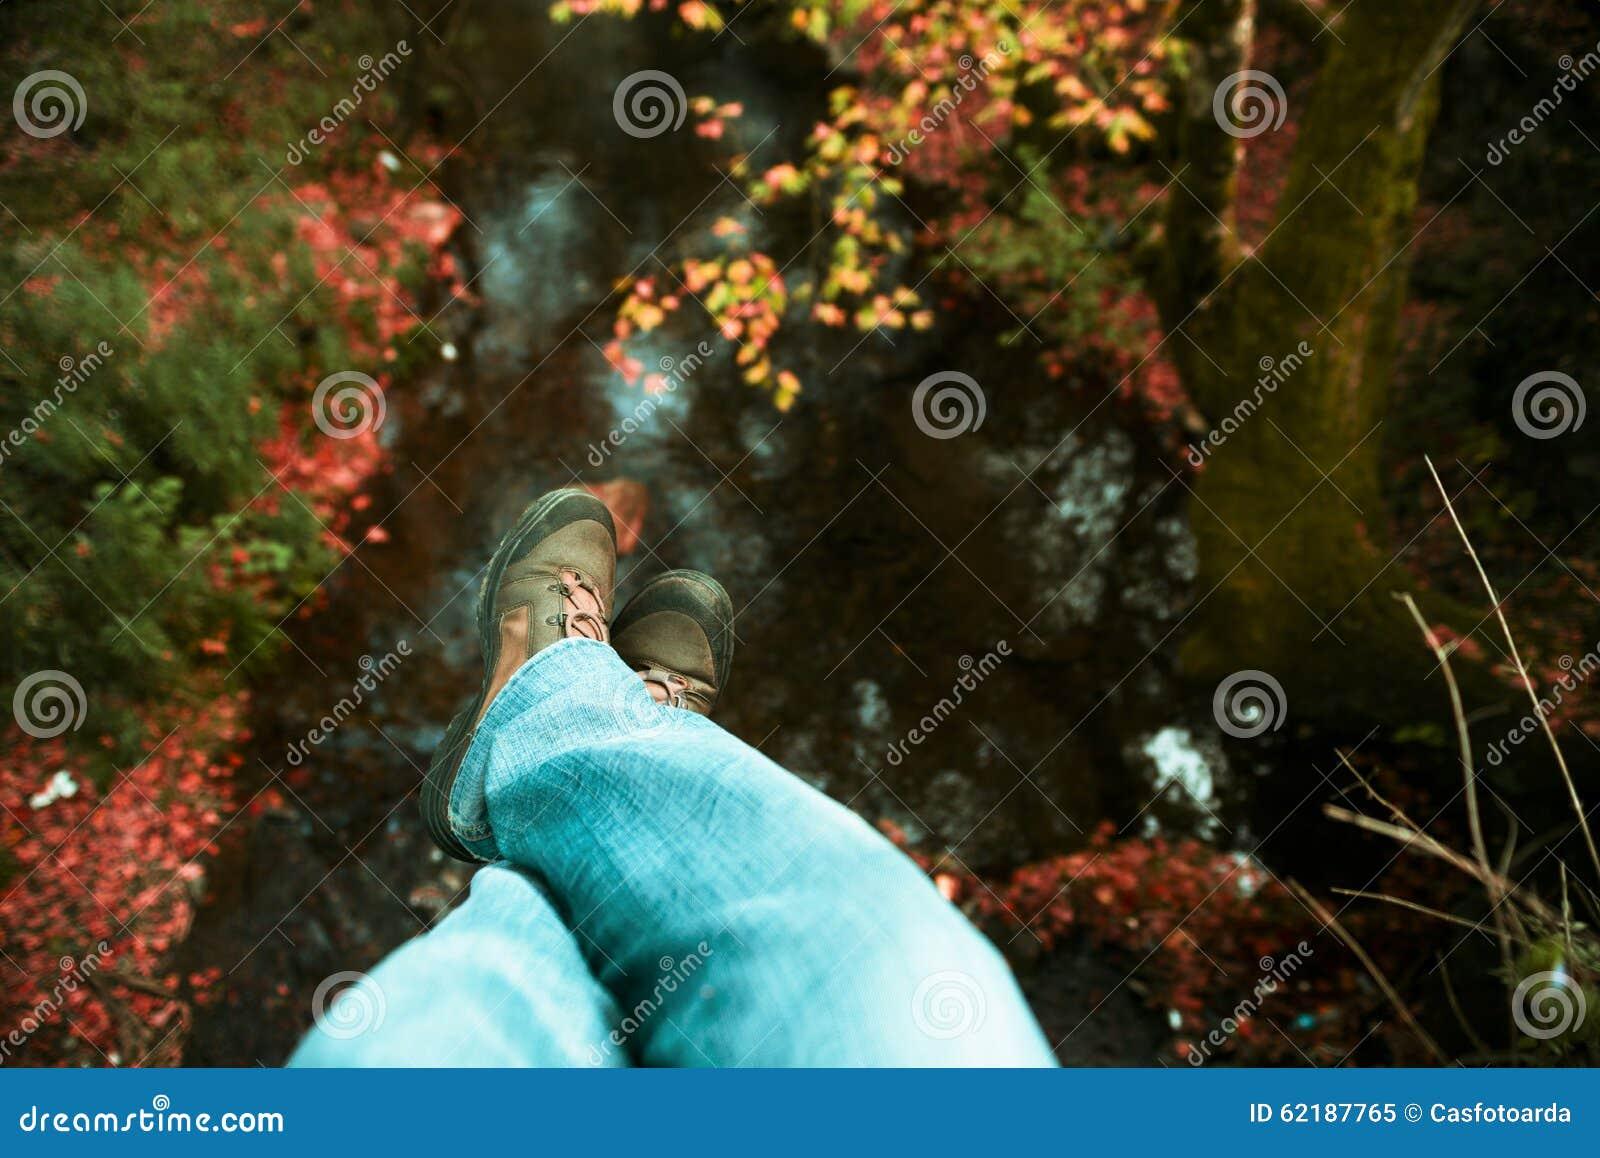 Dangling feet.